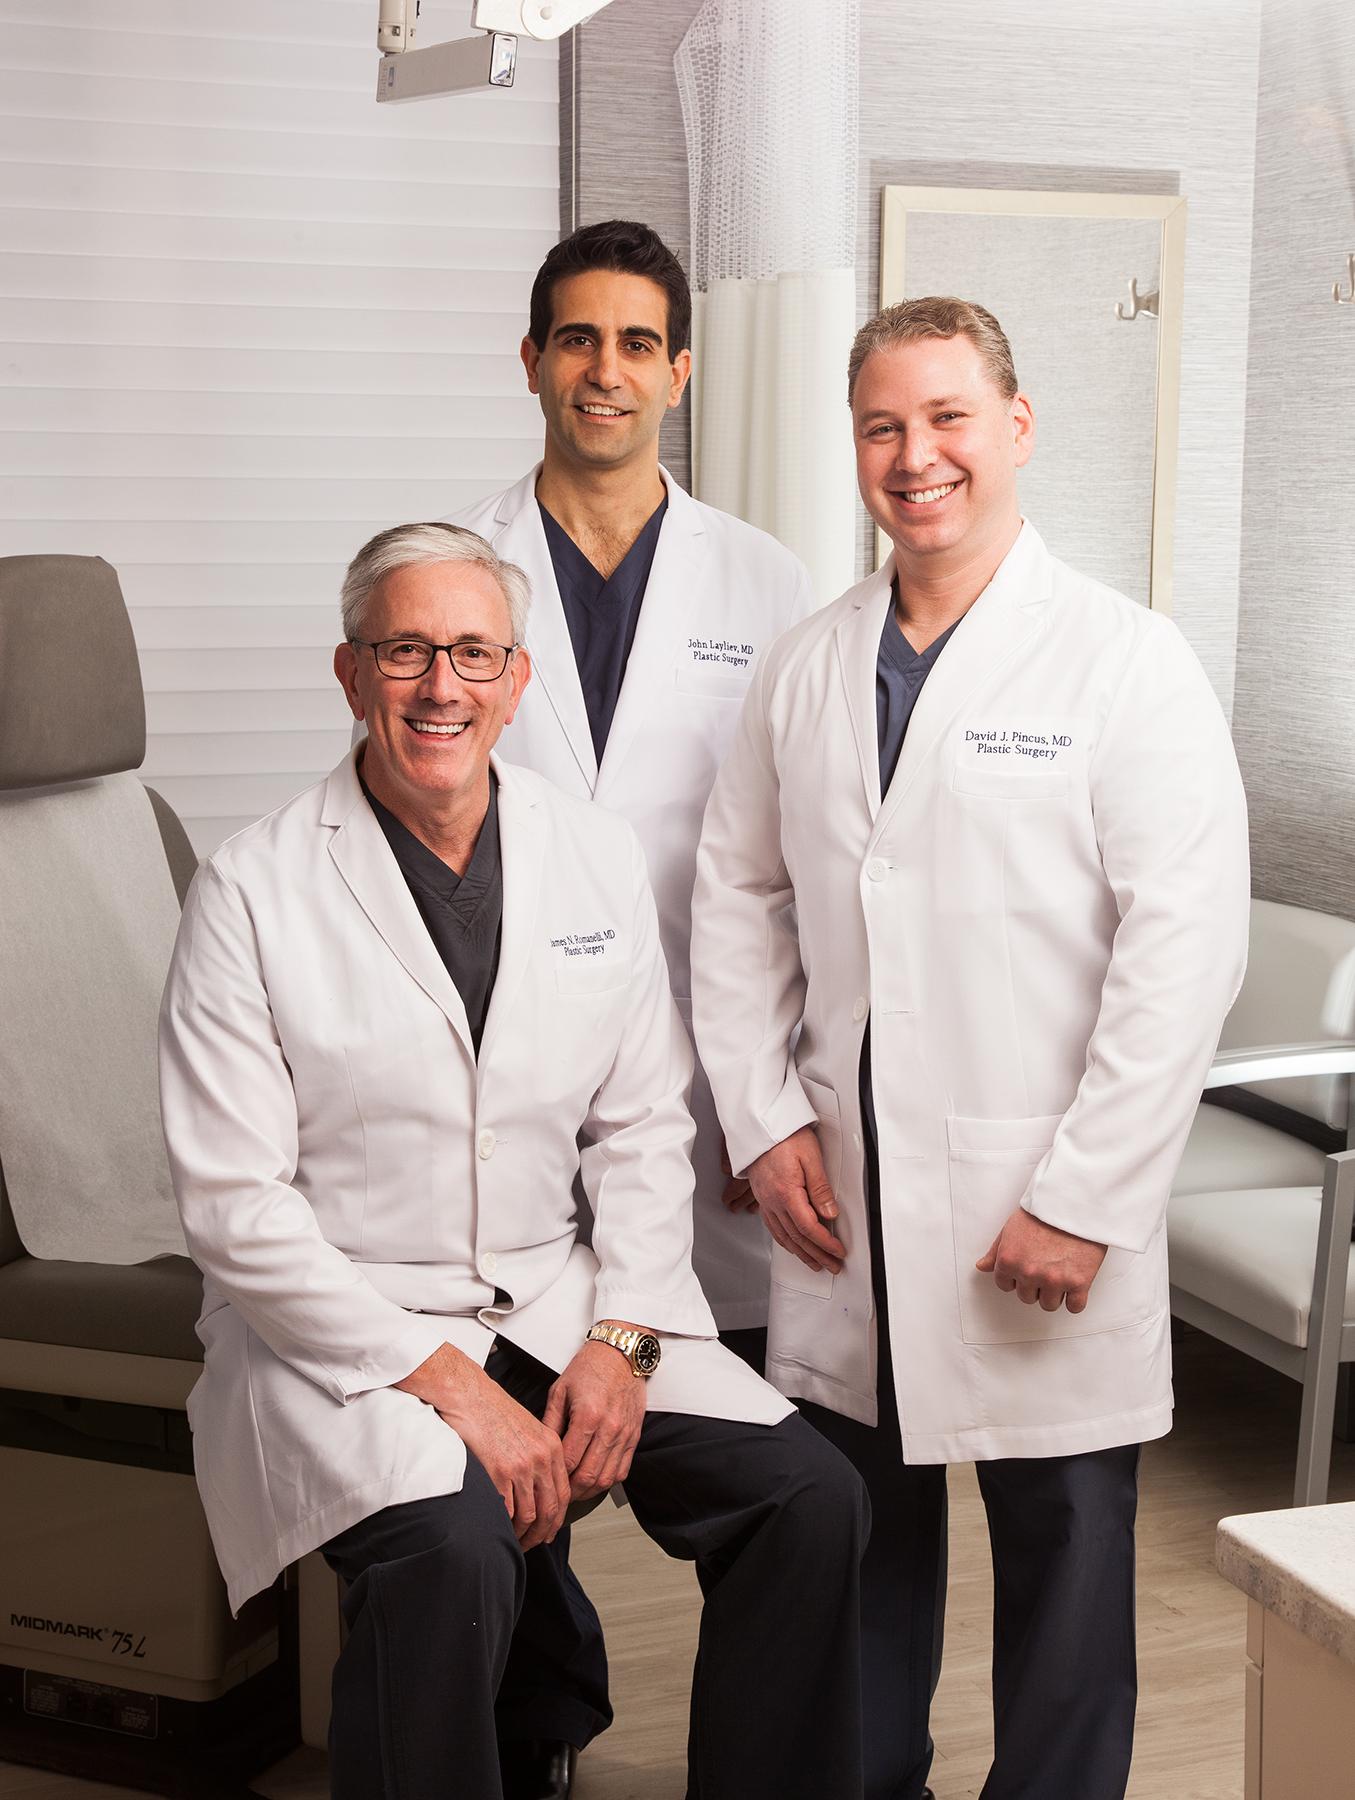 Dr.-Romanelli-Cosmetic-Surgery-Group-Staff-Profile-Portrait-NY-©-Jonathan-R-Beckerman.jpg